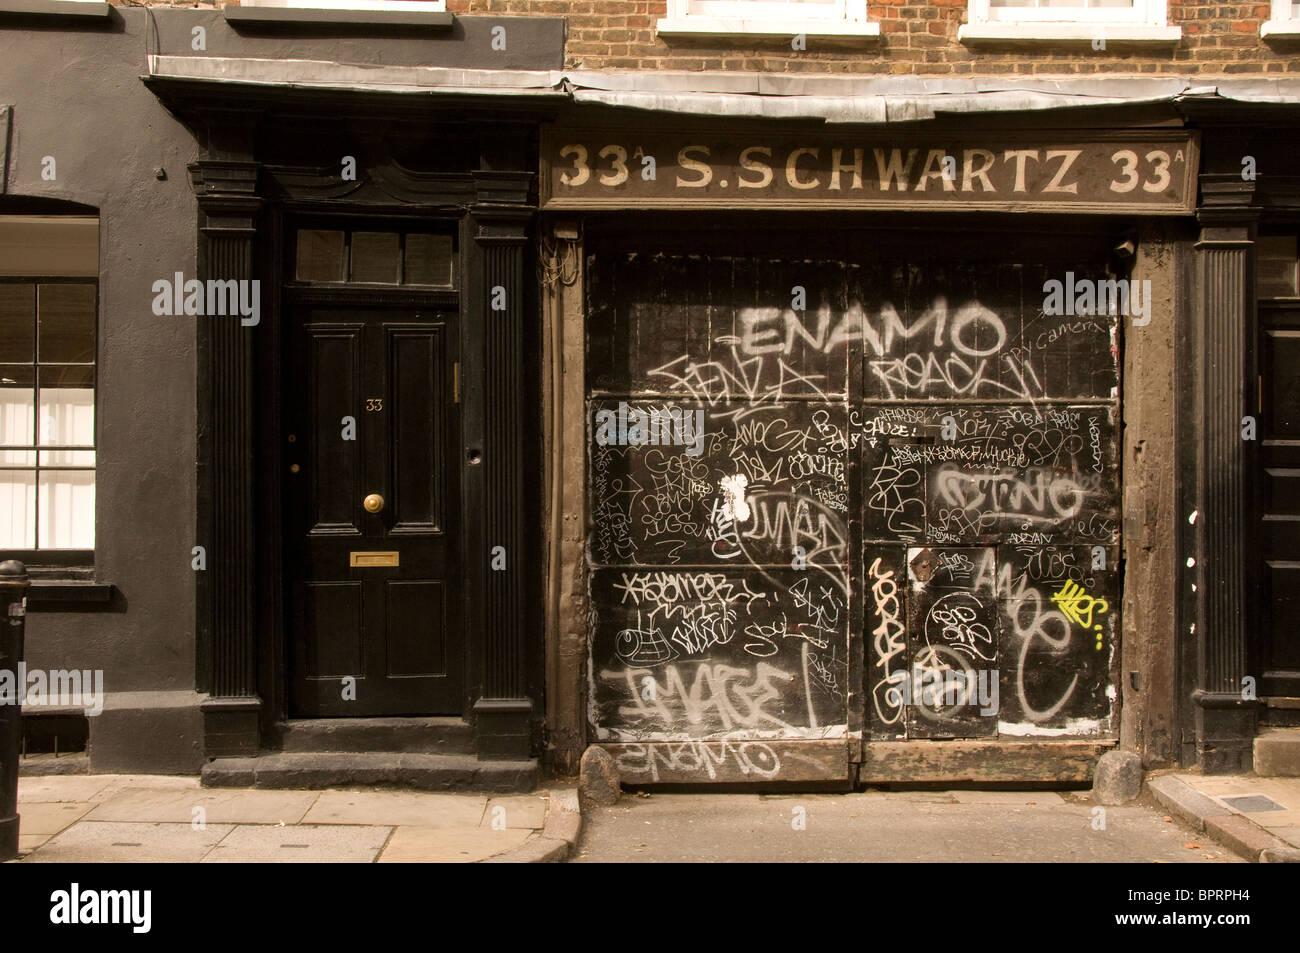 graffitti on vandalized building near Brick Lane London UK - Stock Image